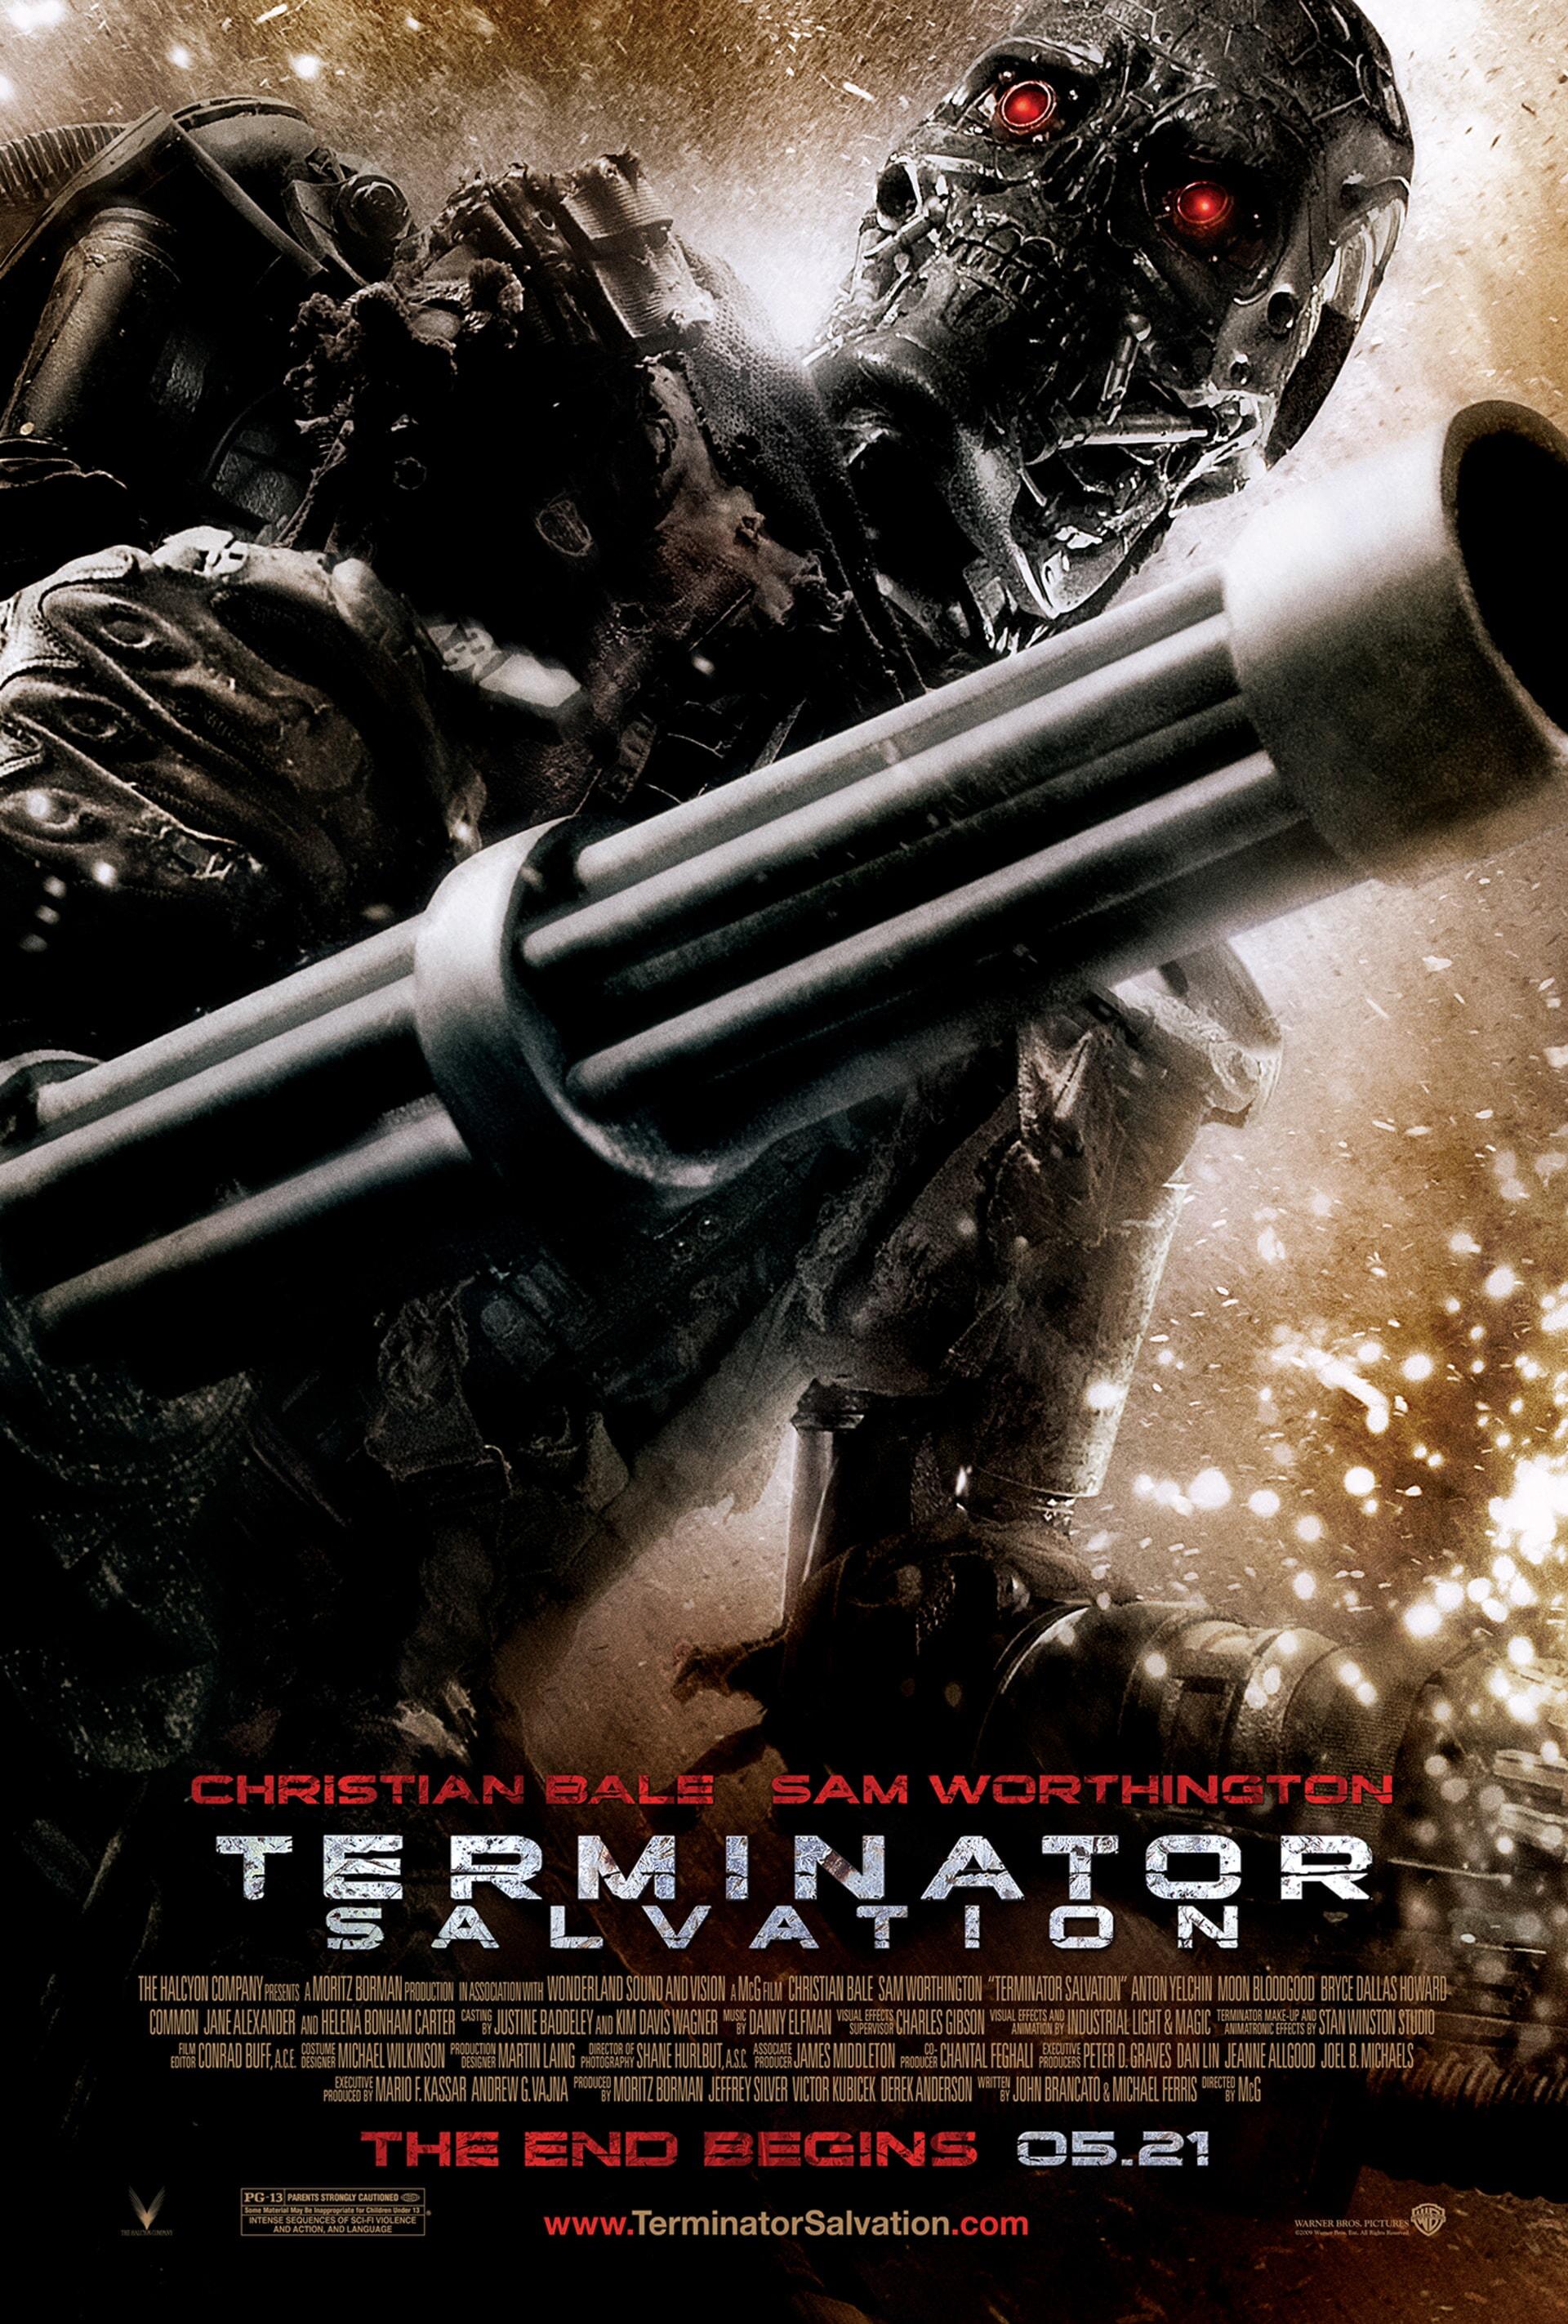 Terminator Salvation - Poster 1